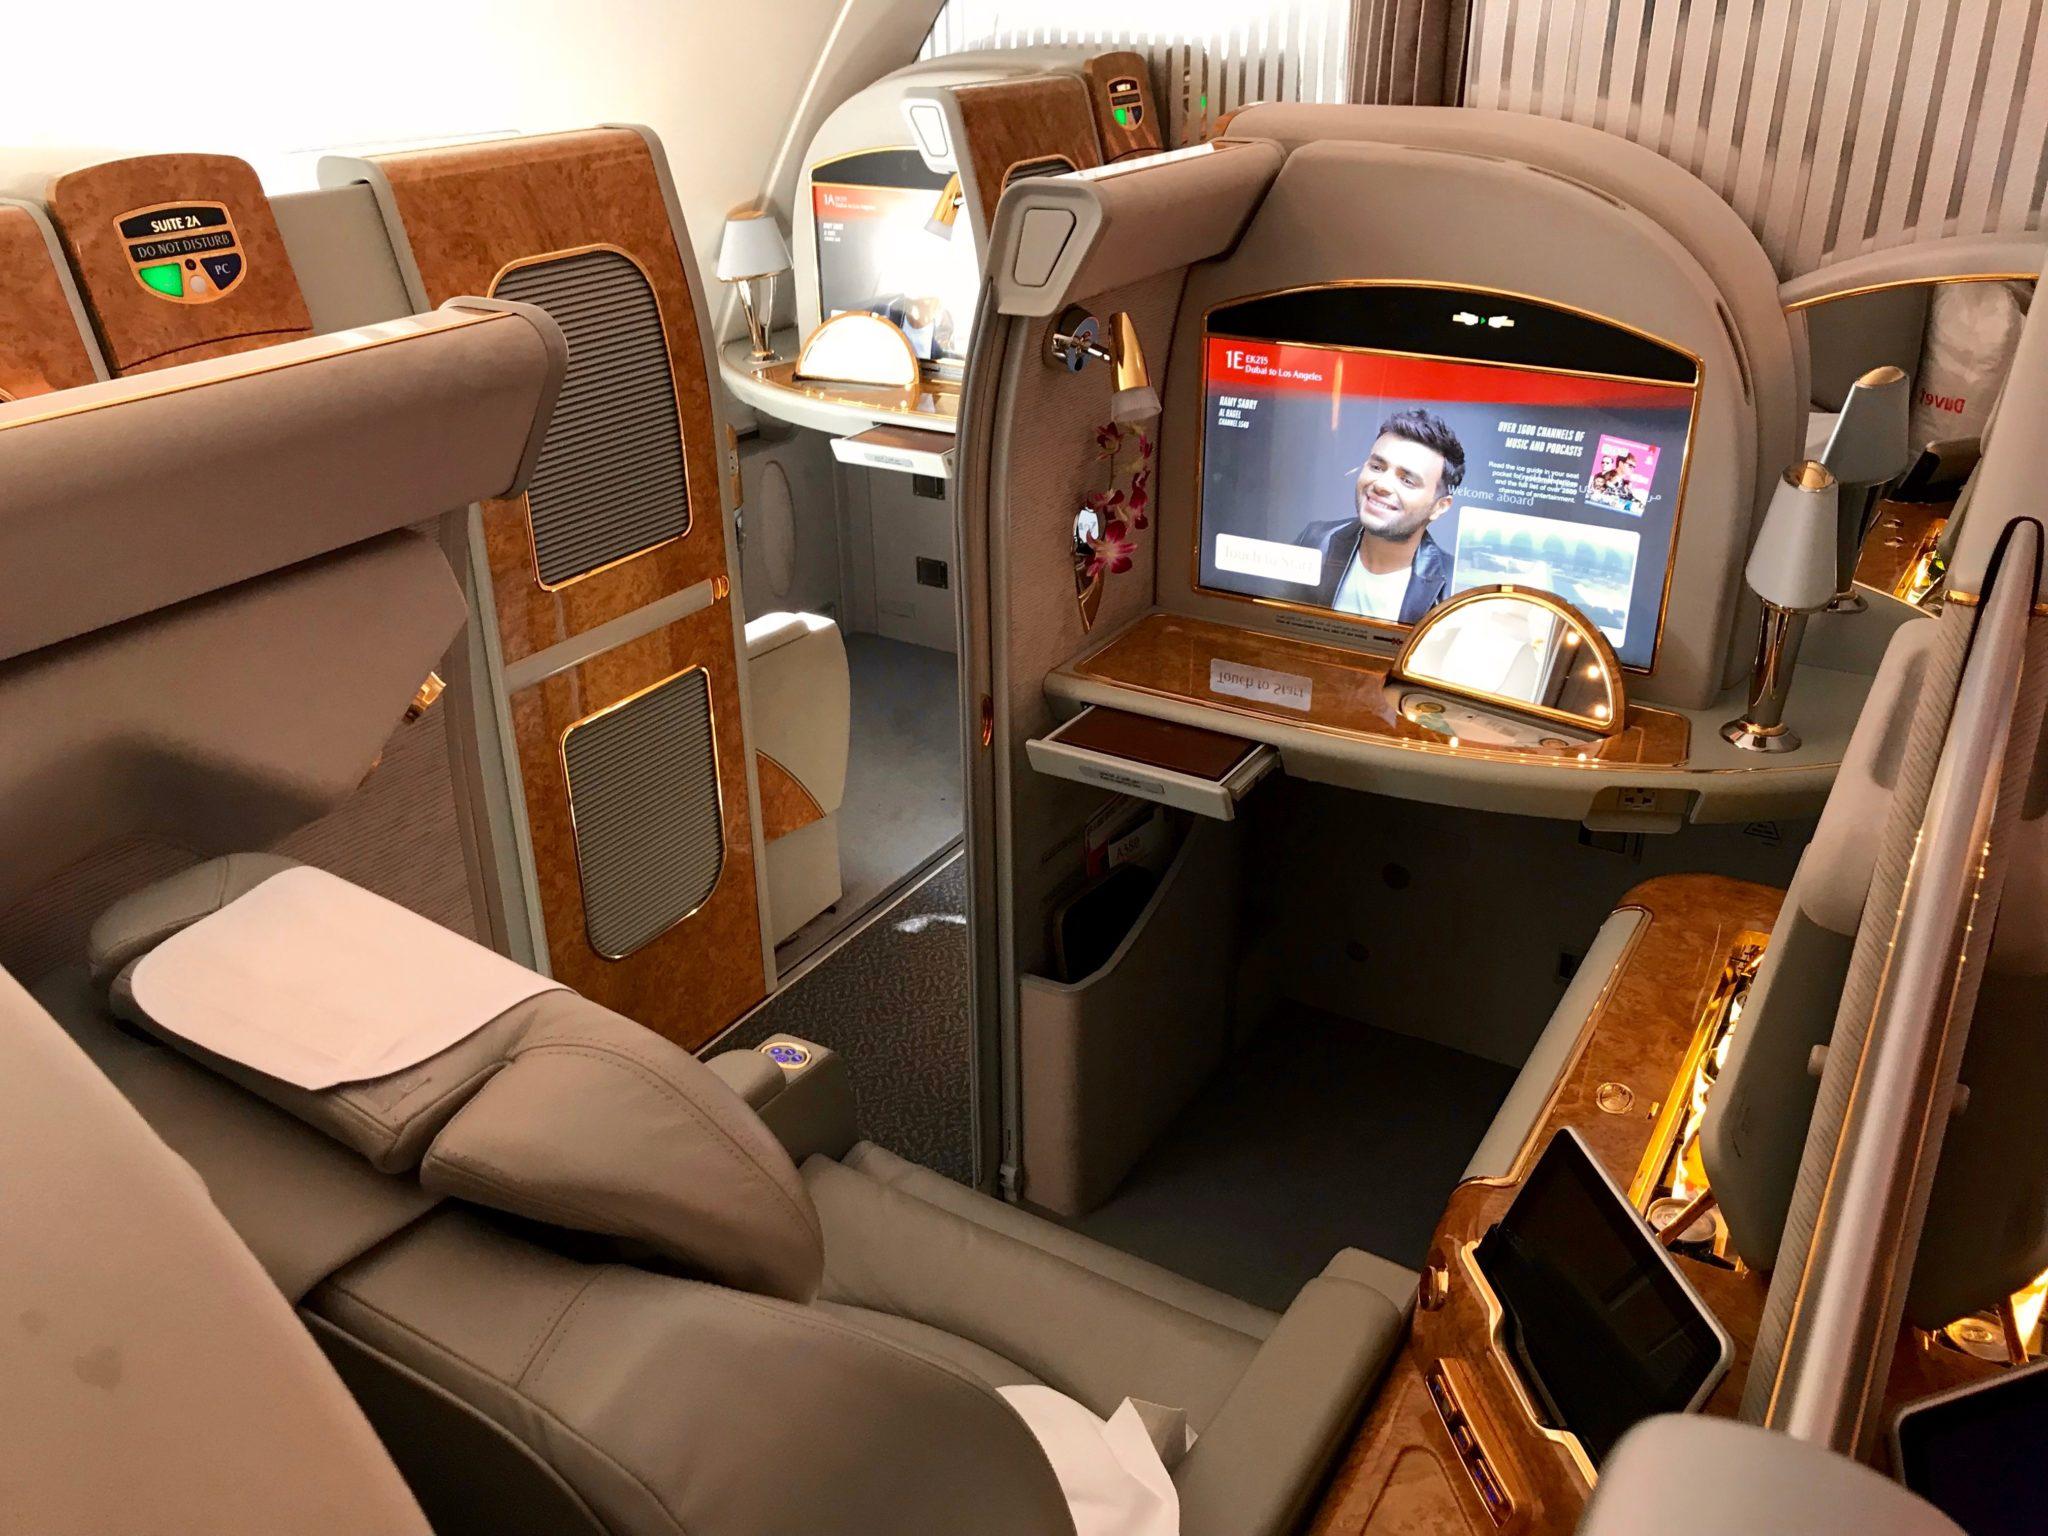 Emirates First Class A380 - Seat 1E